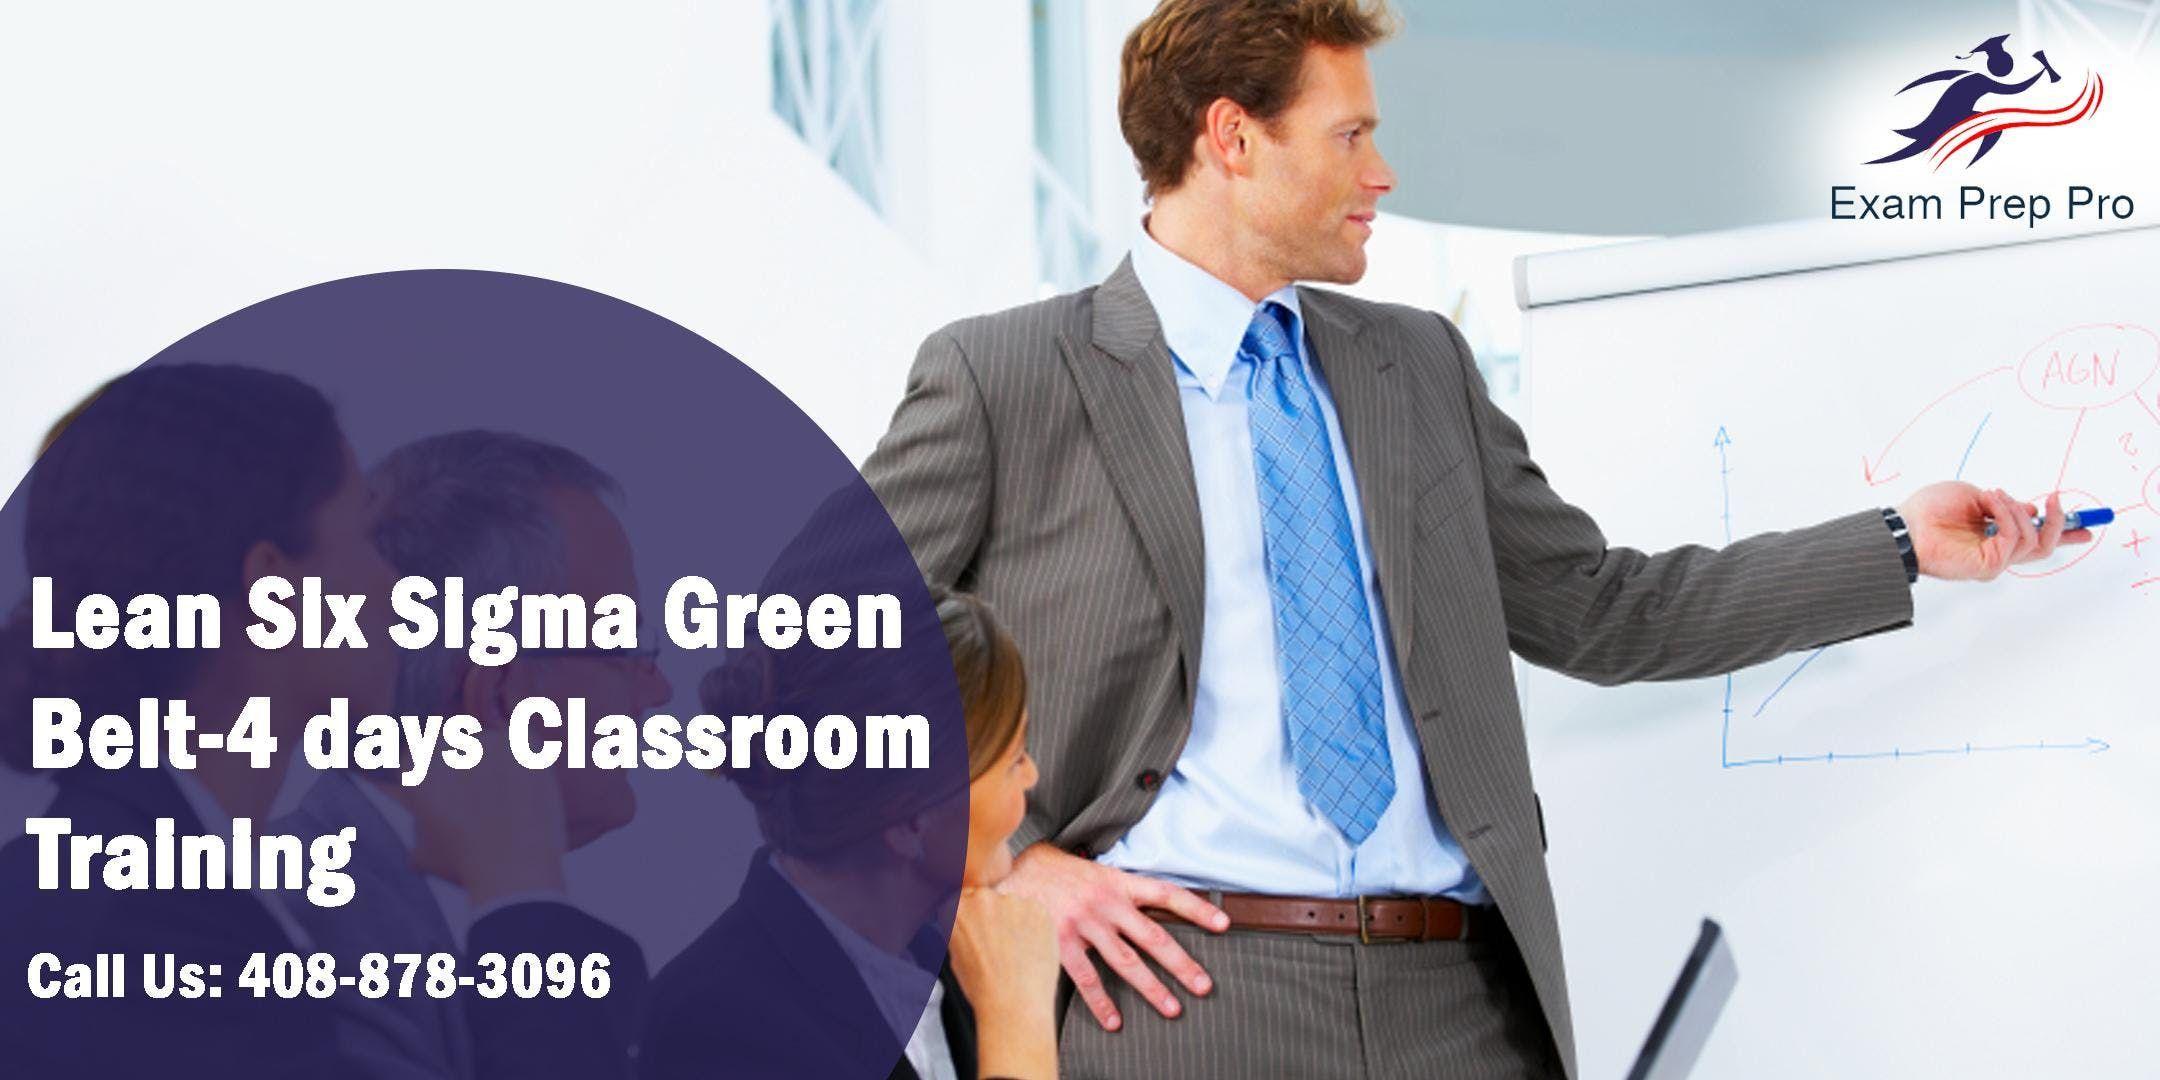 Lean Six Sigma Green Belt(LSSGB)- 4 days Classroom Training Pittsburgh